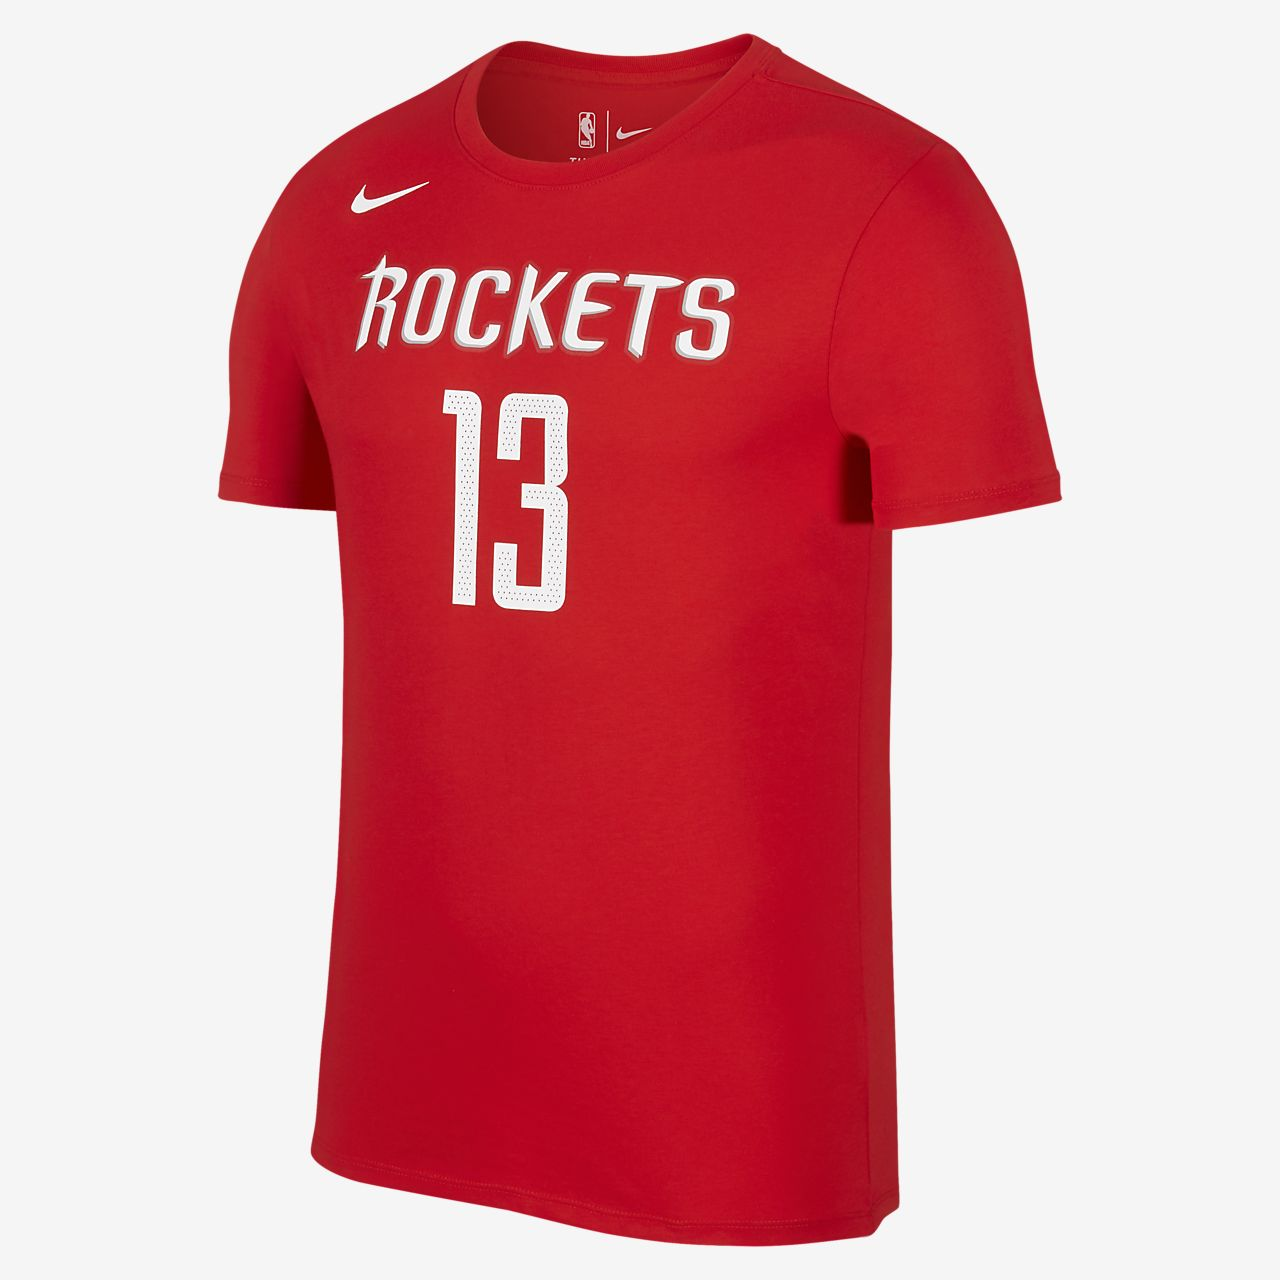 nike dri fit nba rockets harden men 39 s basketball t shirt. Black Bedroom Furniture Sets. Home Design Ideas